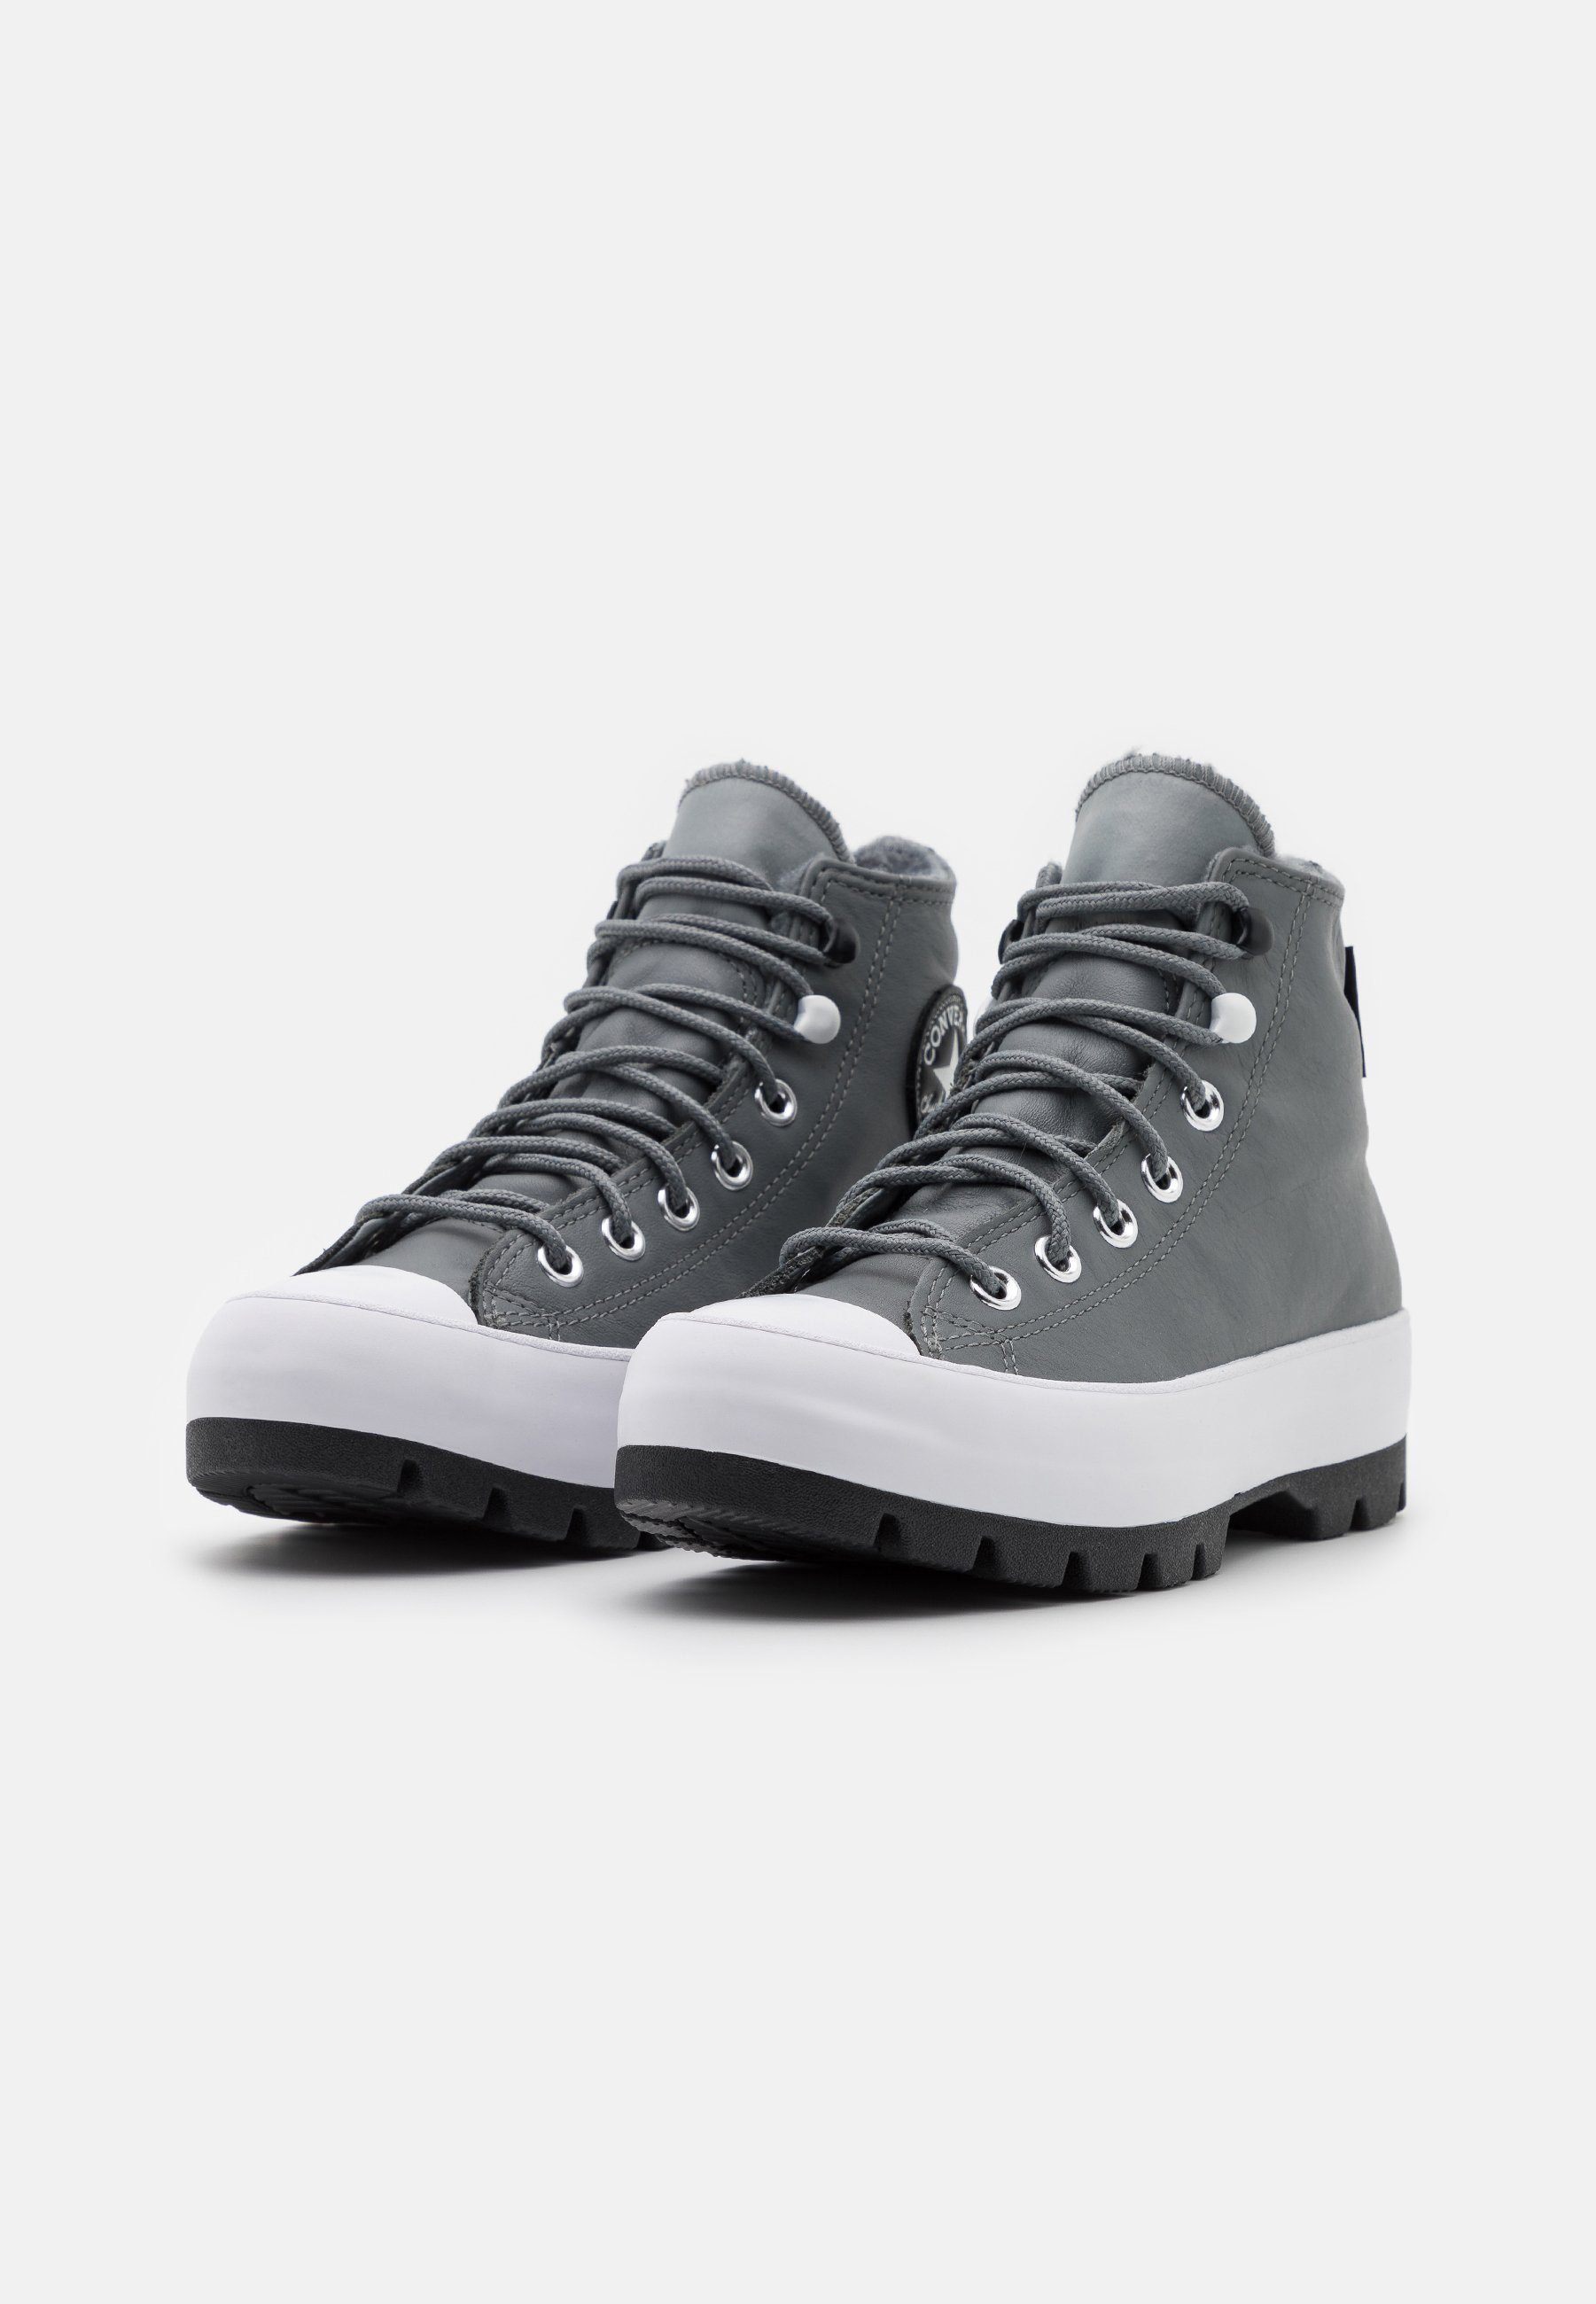 Converse CHUCK TAYLOR ALL STAR MC LUGGED Sneaker high limestone grey/black/white/grau